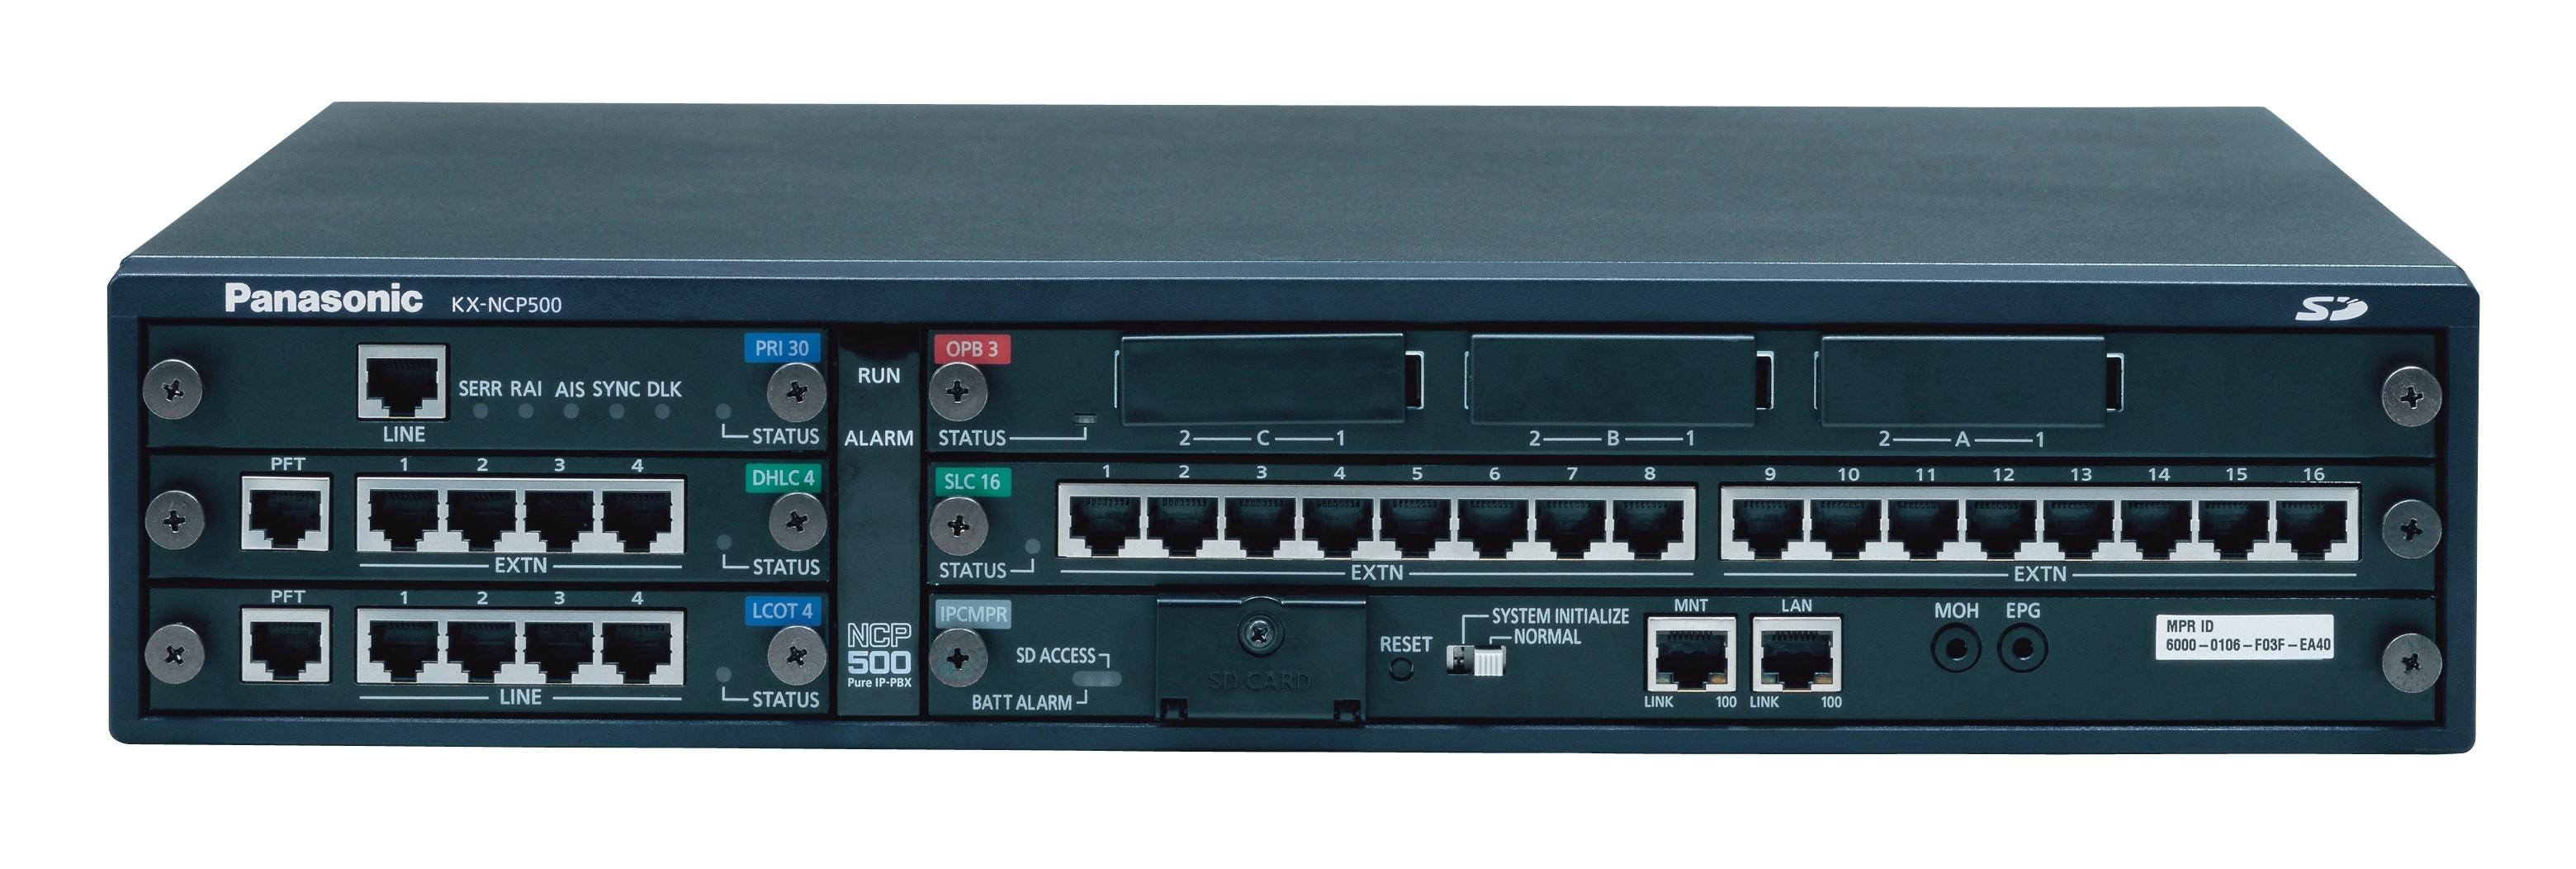 Panasonic KXNCP500X  PBX Telephone System  From 65000